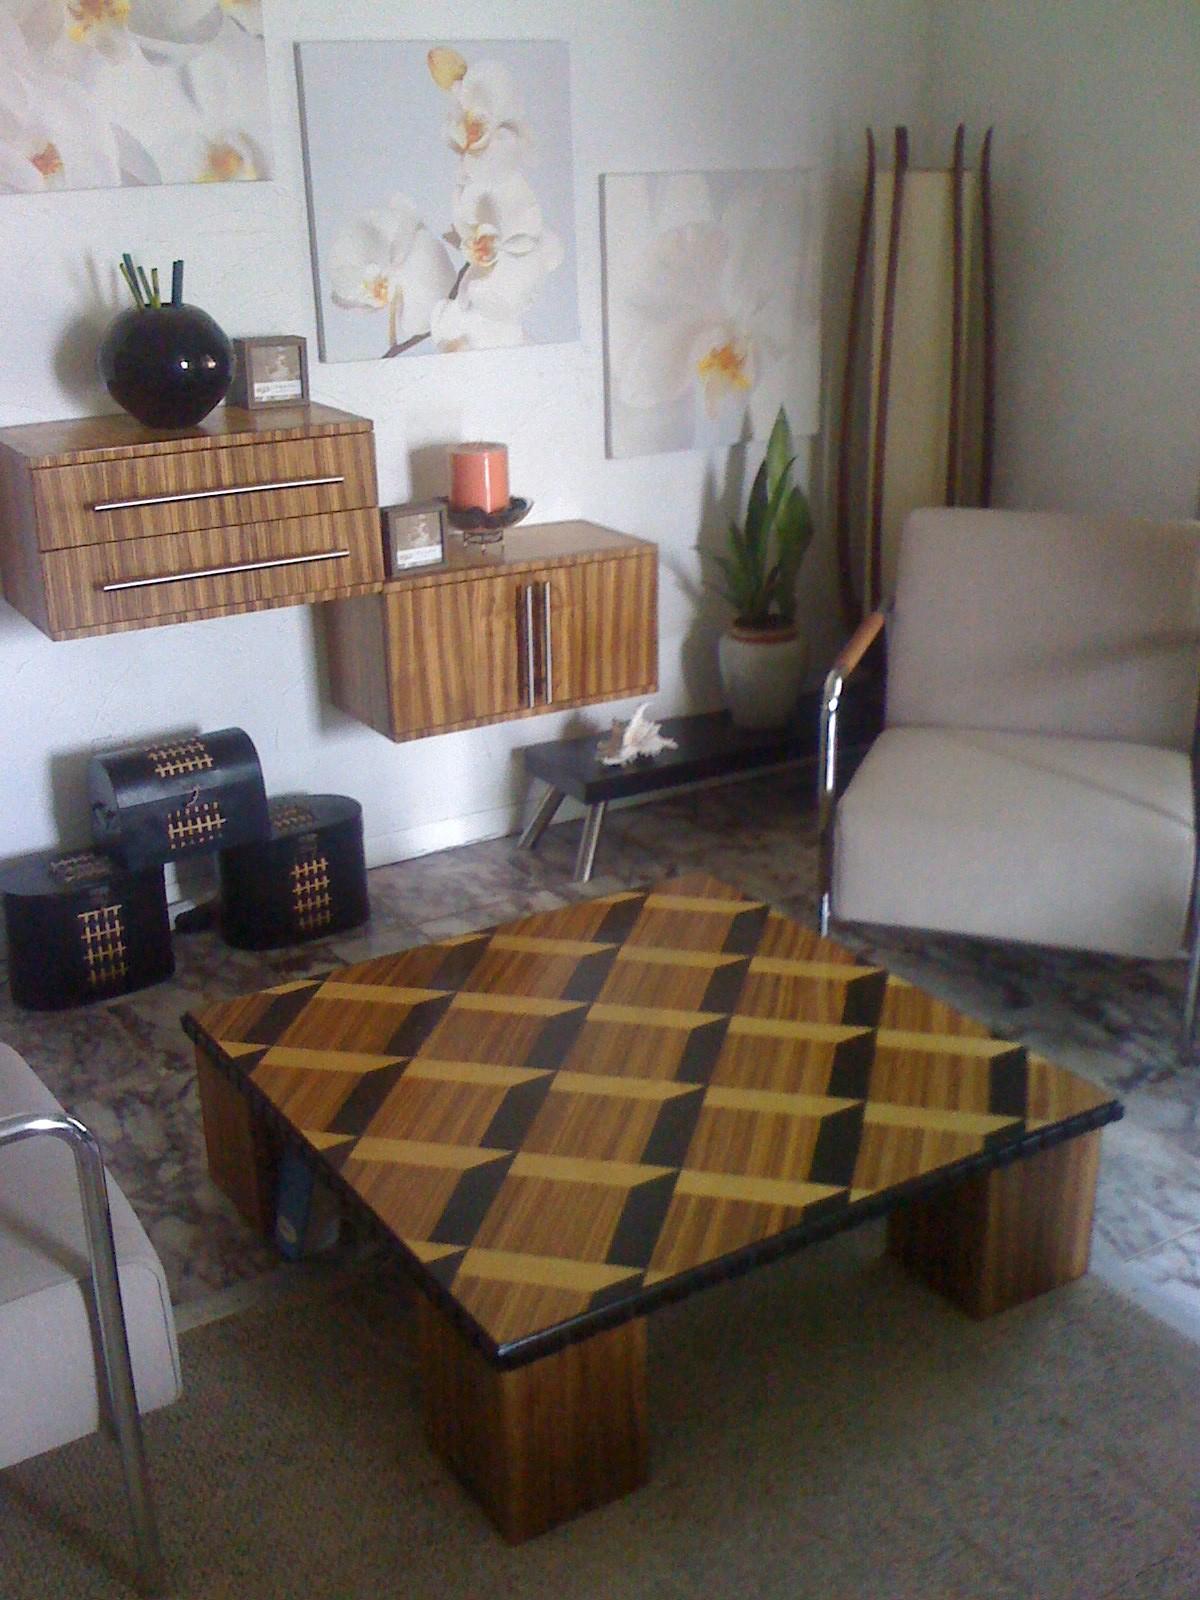 zebra wood coffee table | roy senior,jr | archinect